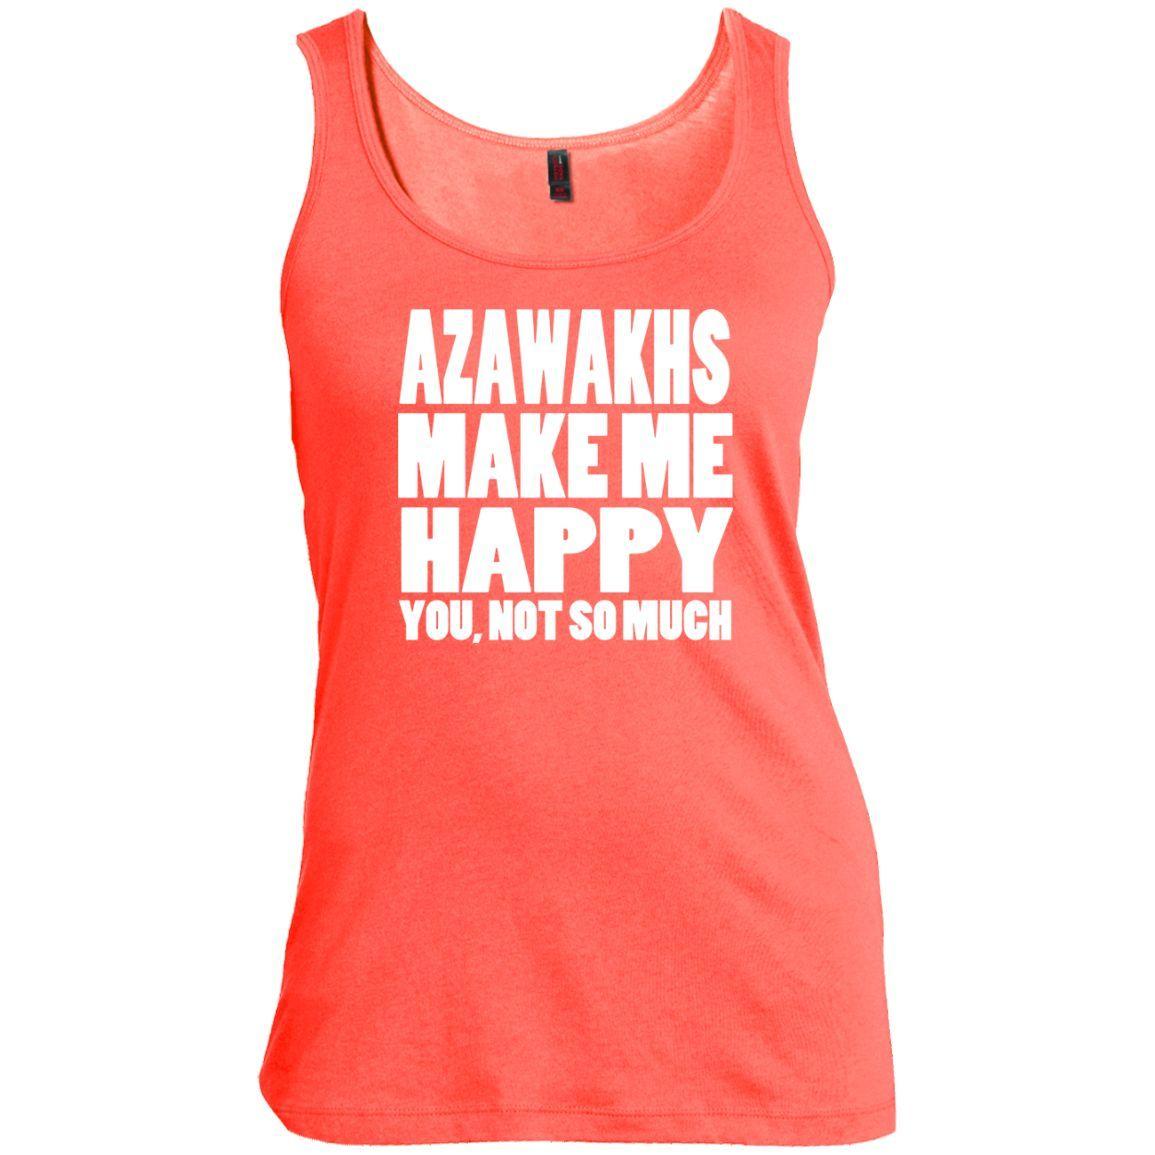 Azawakhs Make Me Happy You Not So Much Scoop Neck Tanks